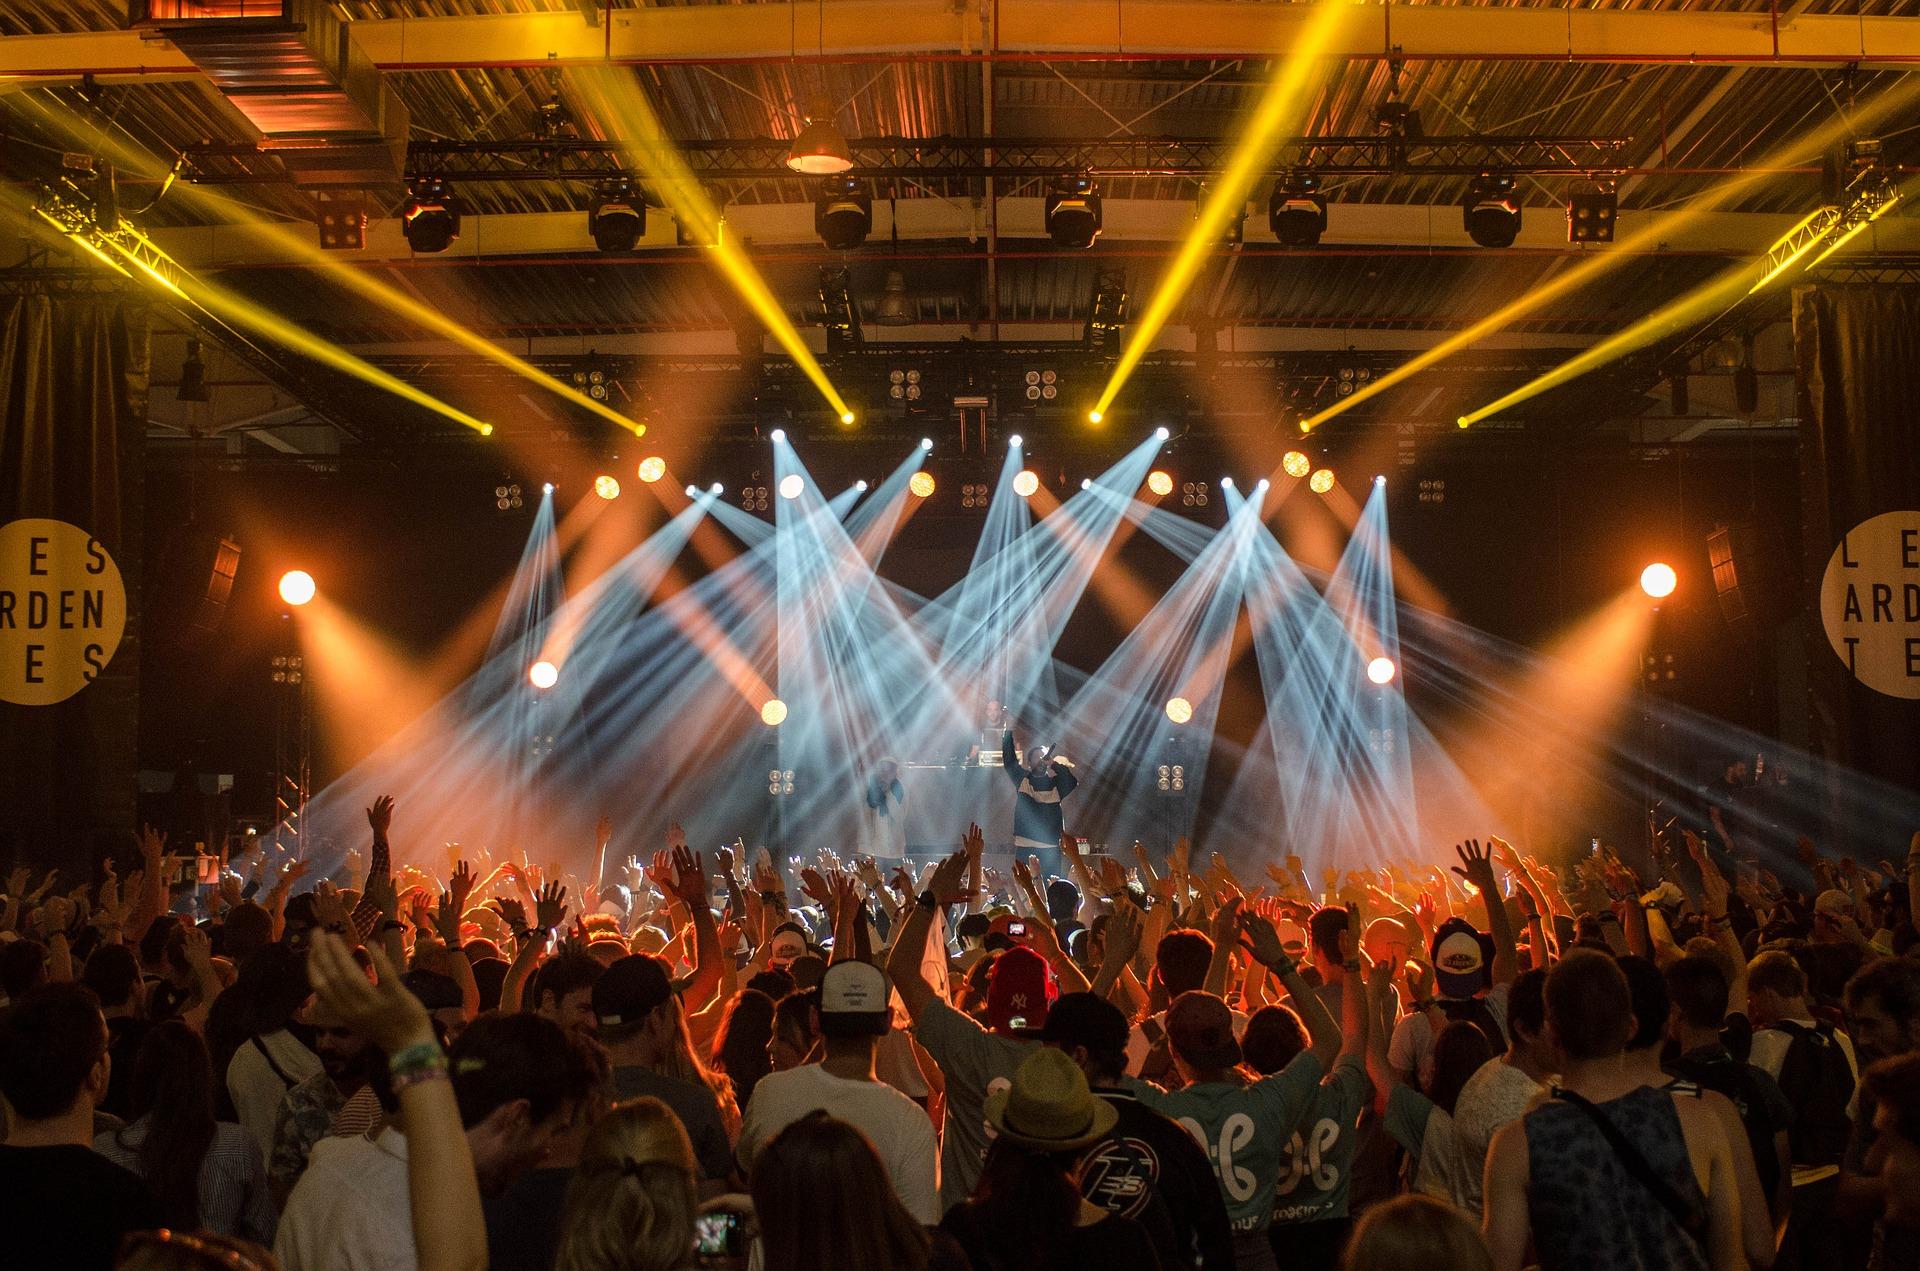 KinKi KidsライブDVD予約、特典案内!最新『MTV Unplugged』最安値、収録曲など詳細